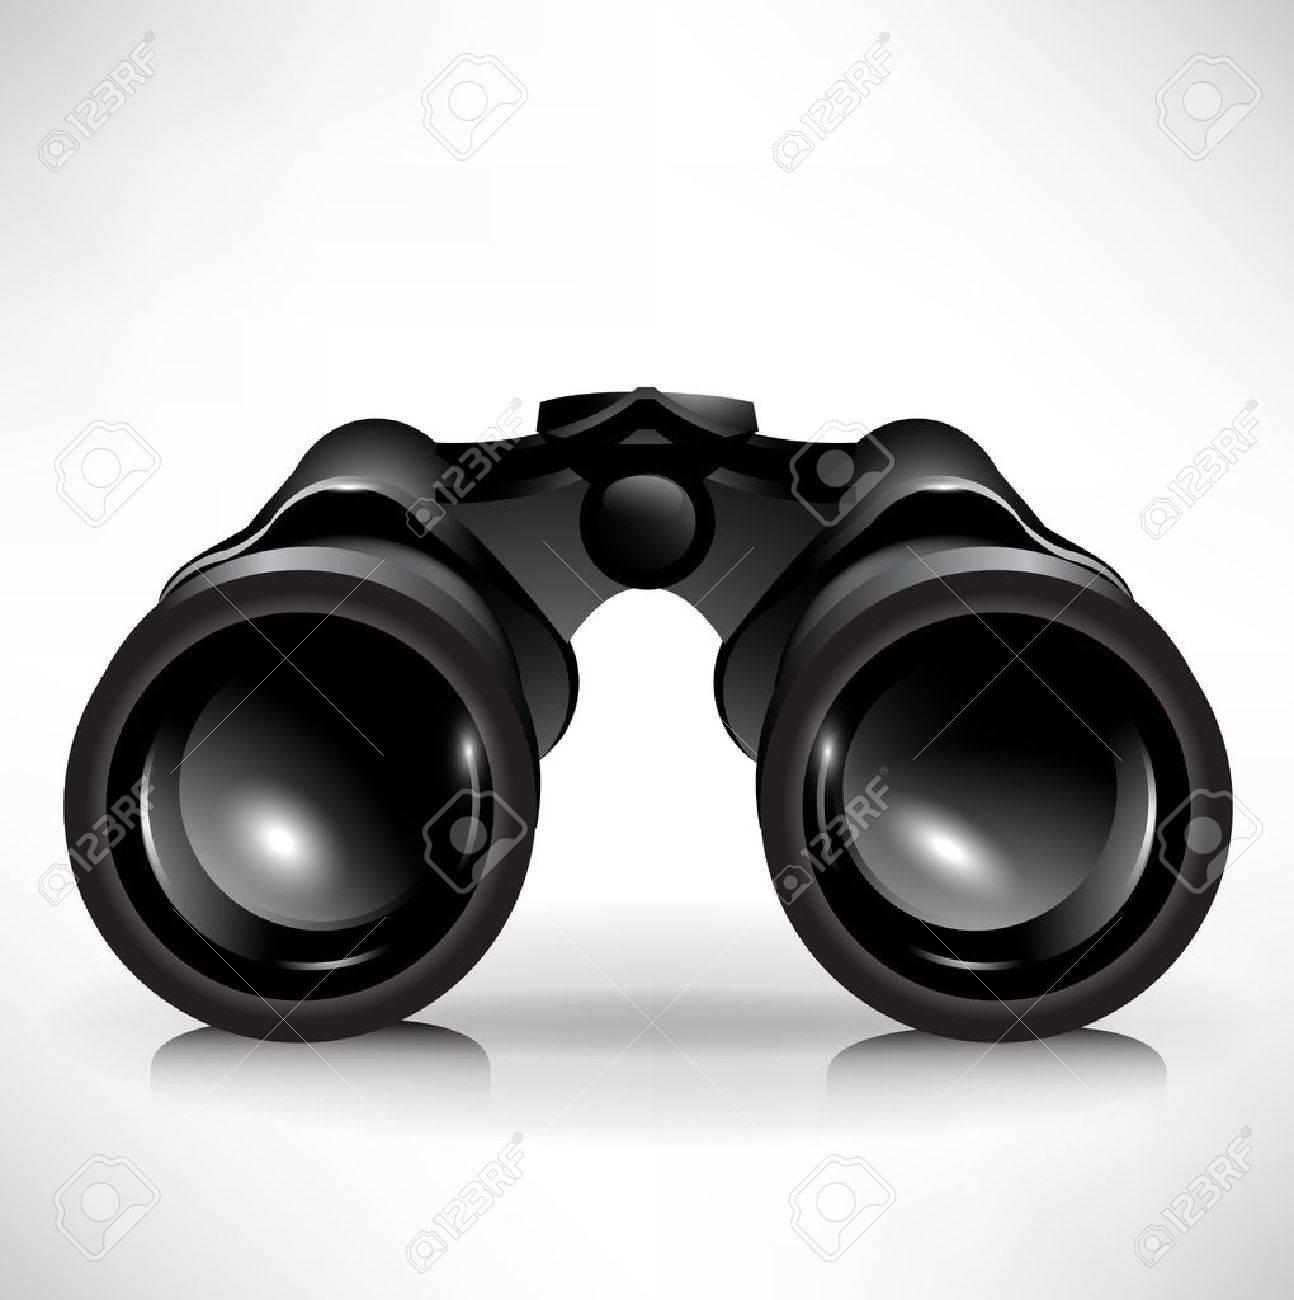 single shinny binoculars icon illustration Stock Vector - 11031658